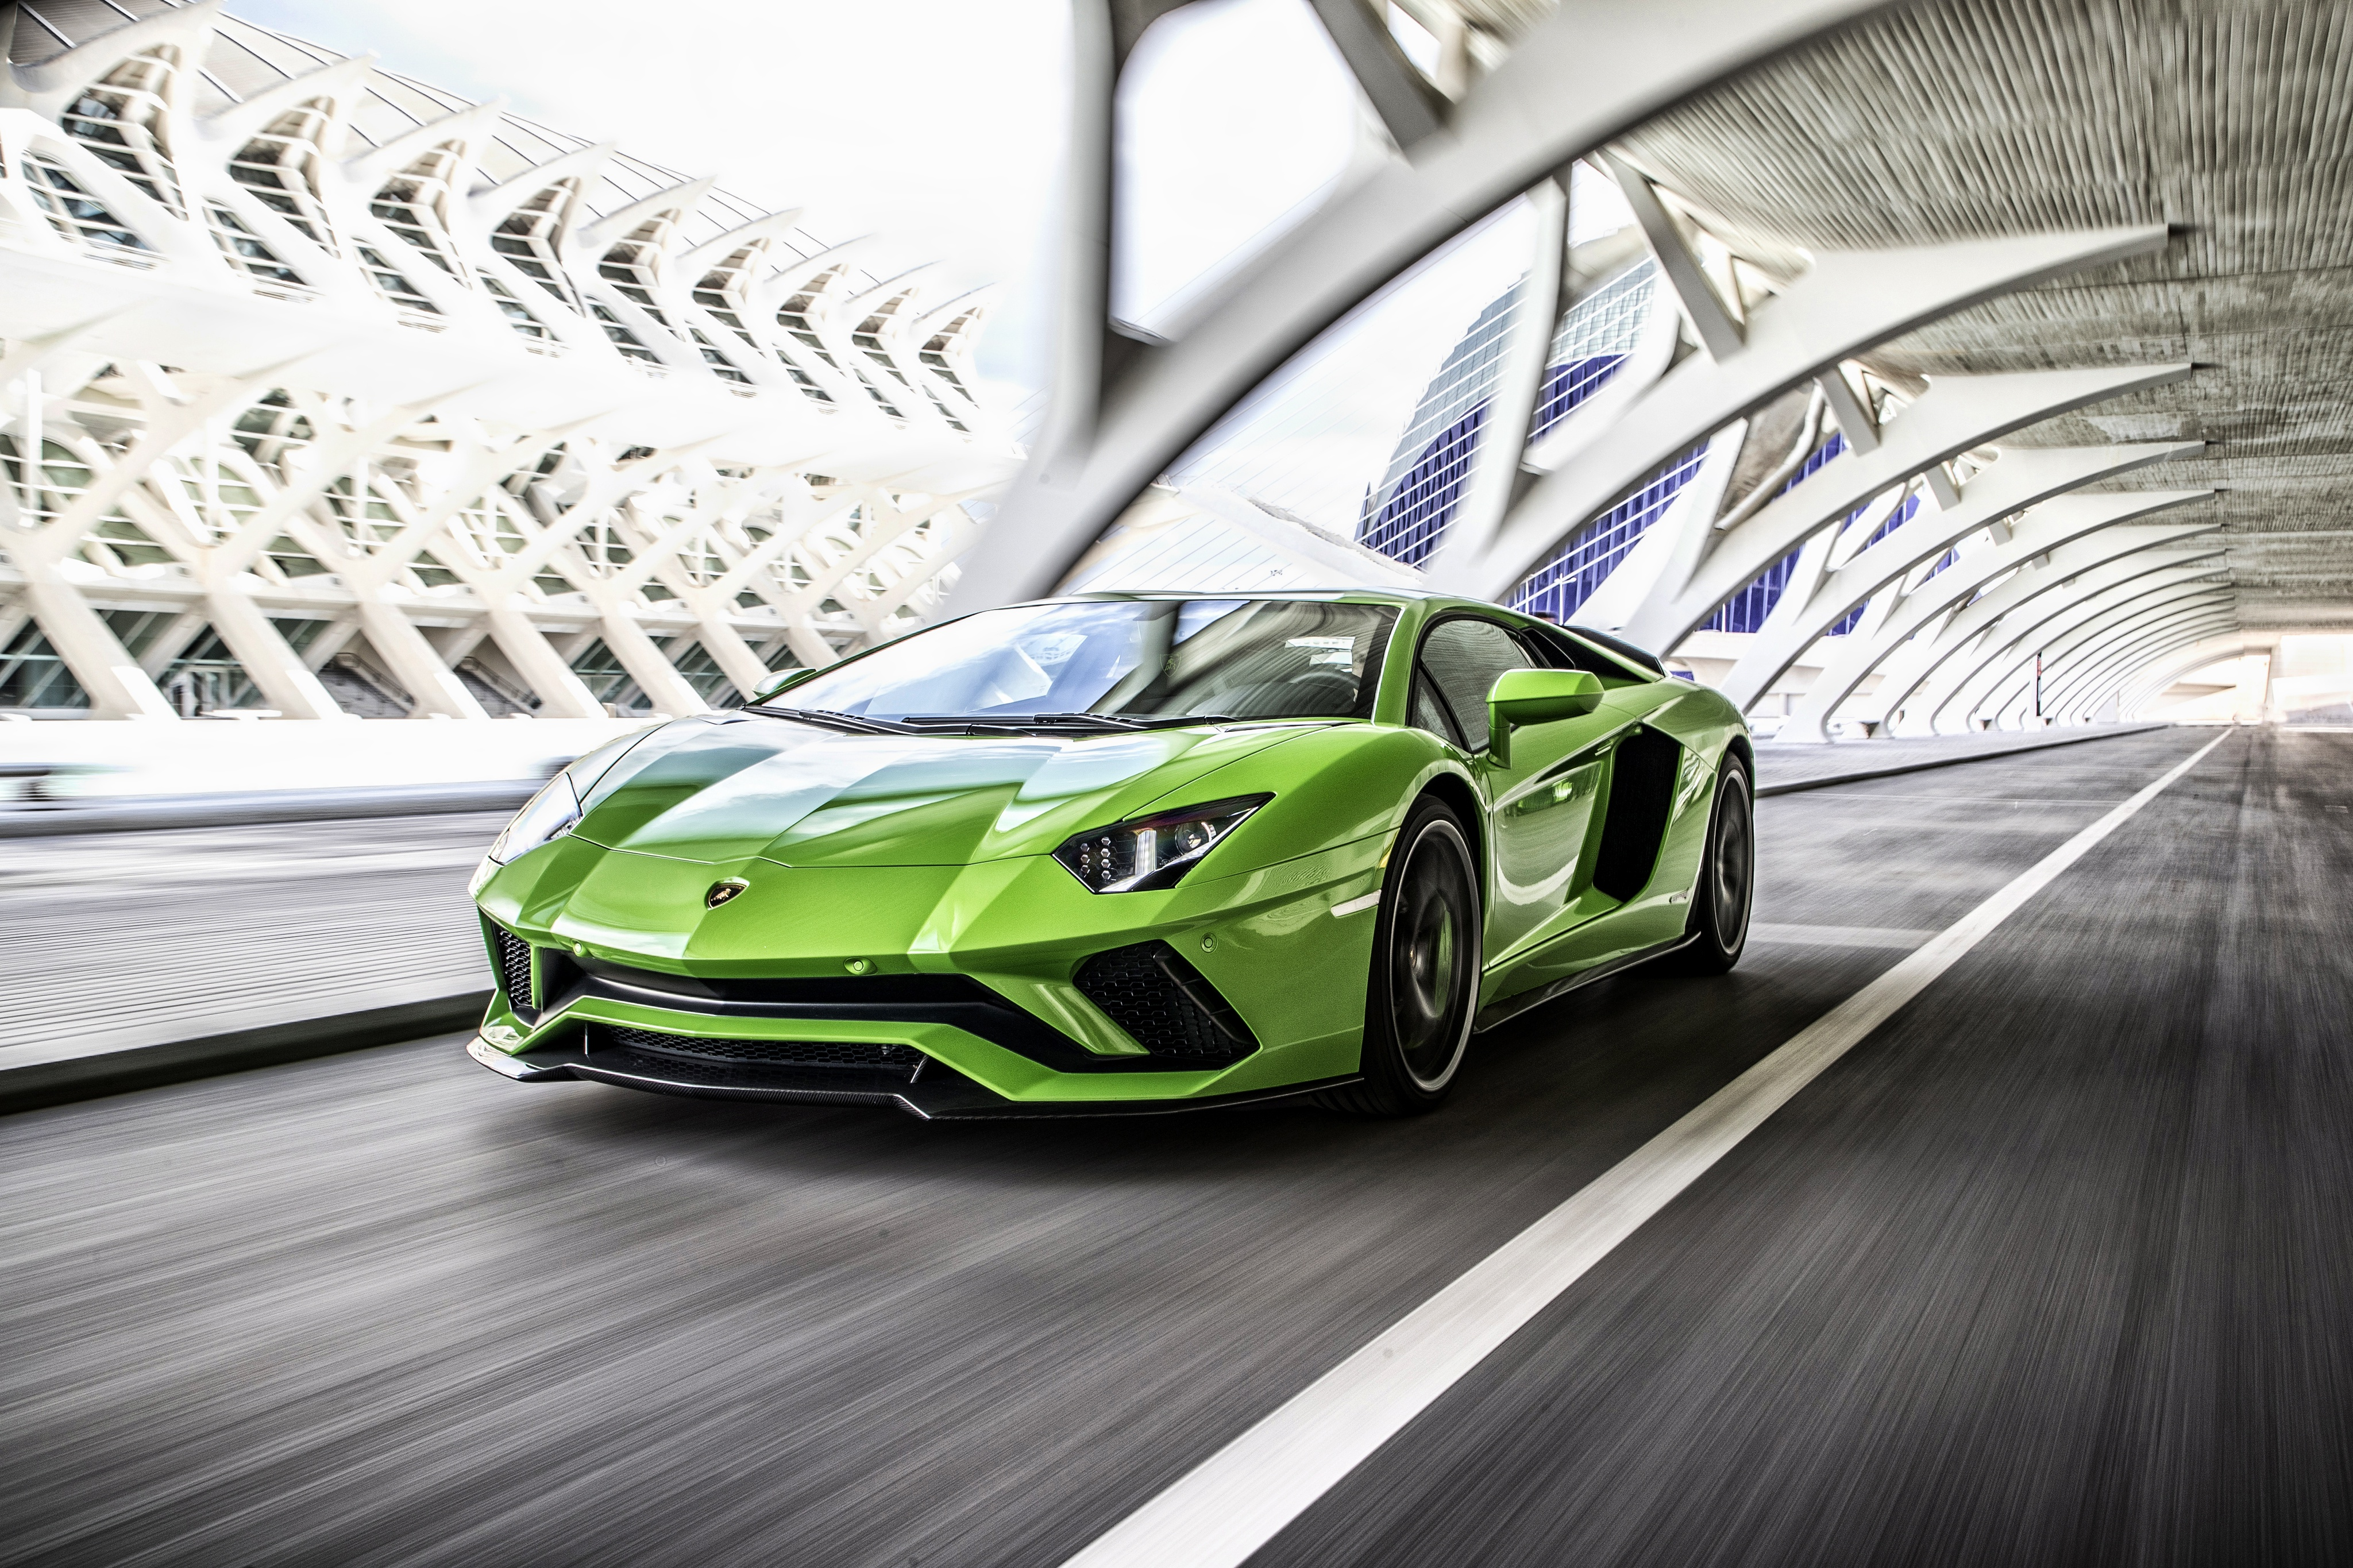 Lamborghini Aventador S 4k Ultra Hd Wallpaper Hintergrund